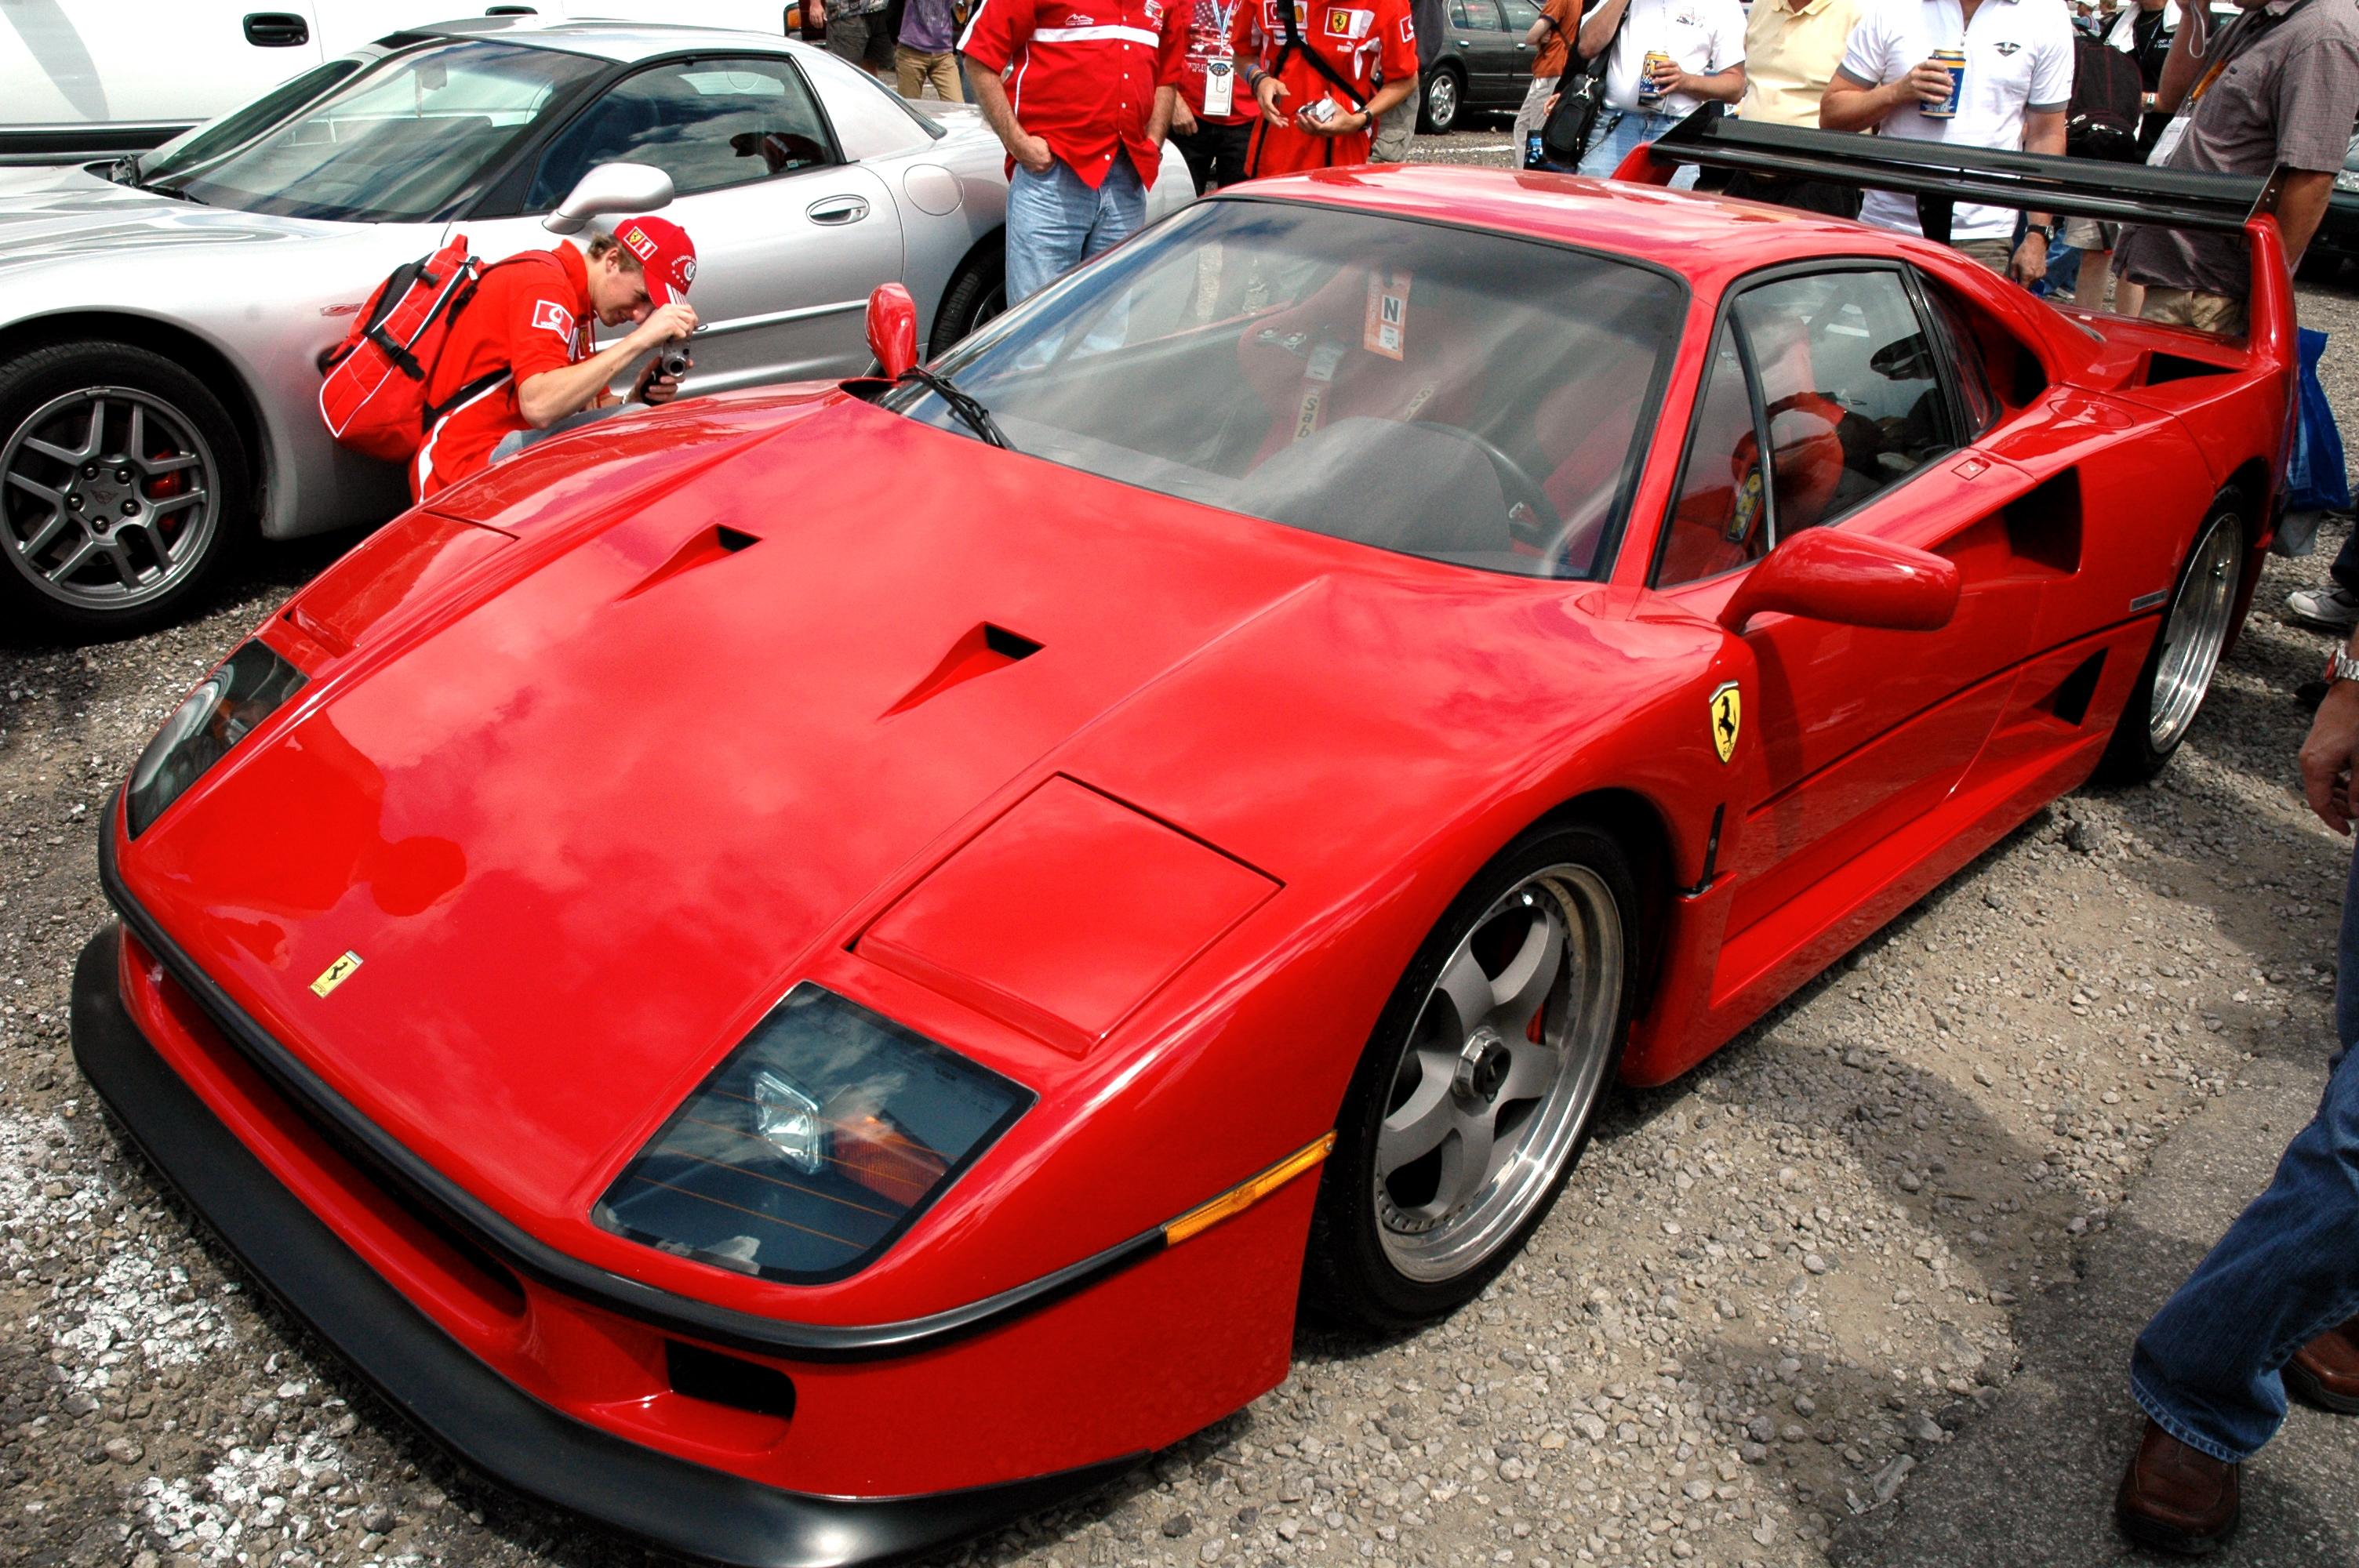 https://upload.wikimedia.org/wikipedia/commons/3/3e/Ferrari_F40_in_IMS_parking_lot.jpg